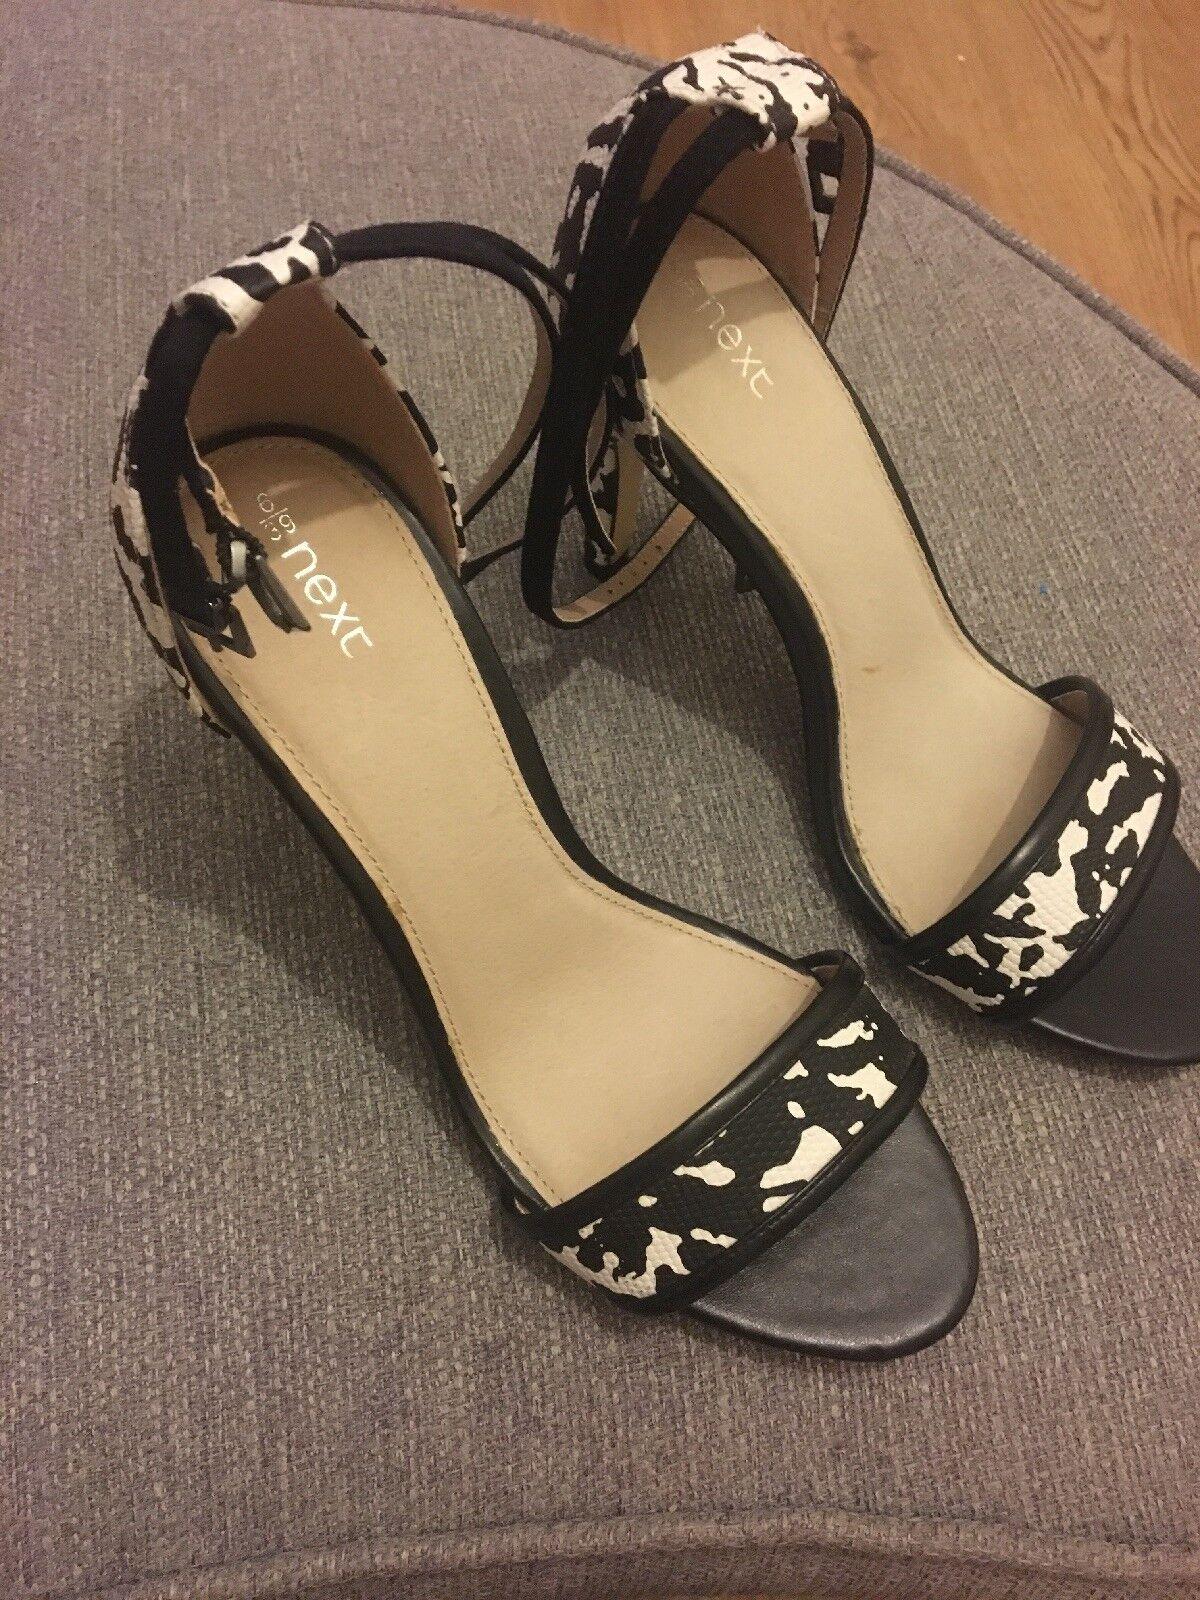 Gentleman/Lady NEXT BRAND NEW SHOES fun Elegant shape Stylish and fun SHOES Fair price 0b8be4